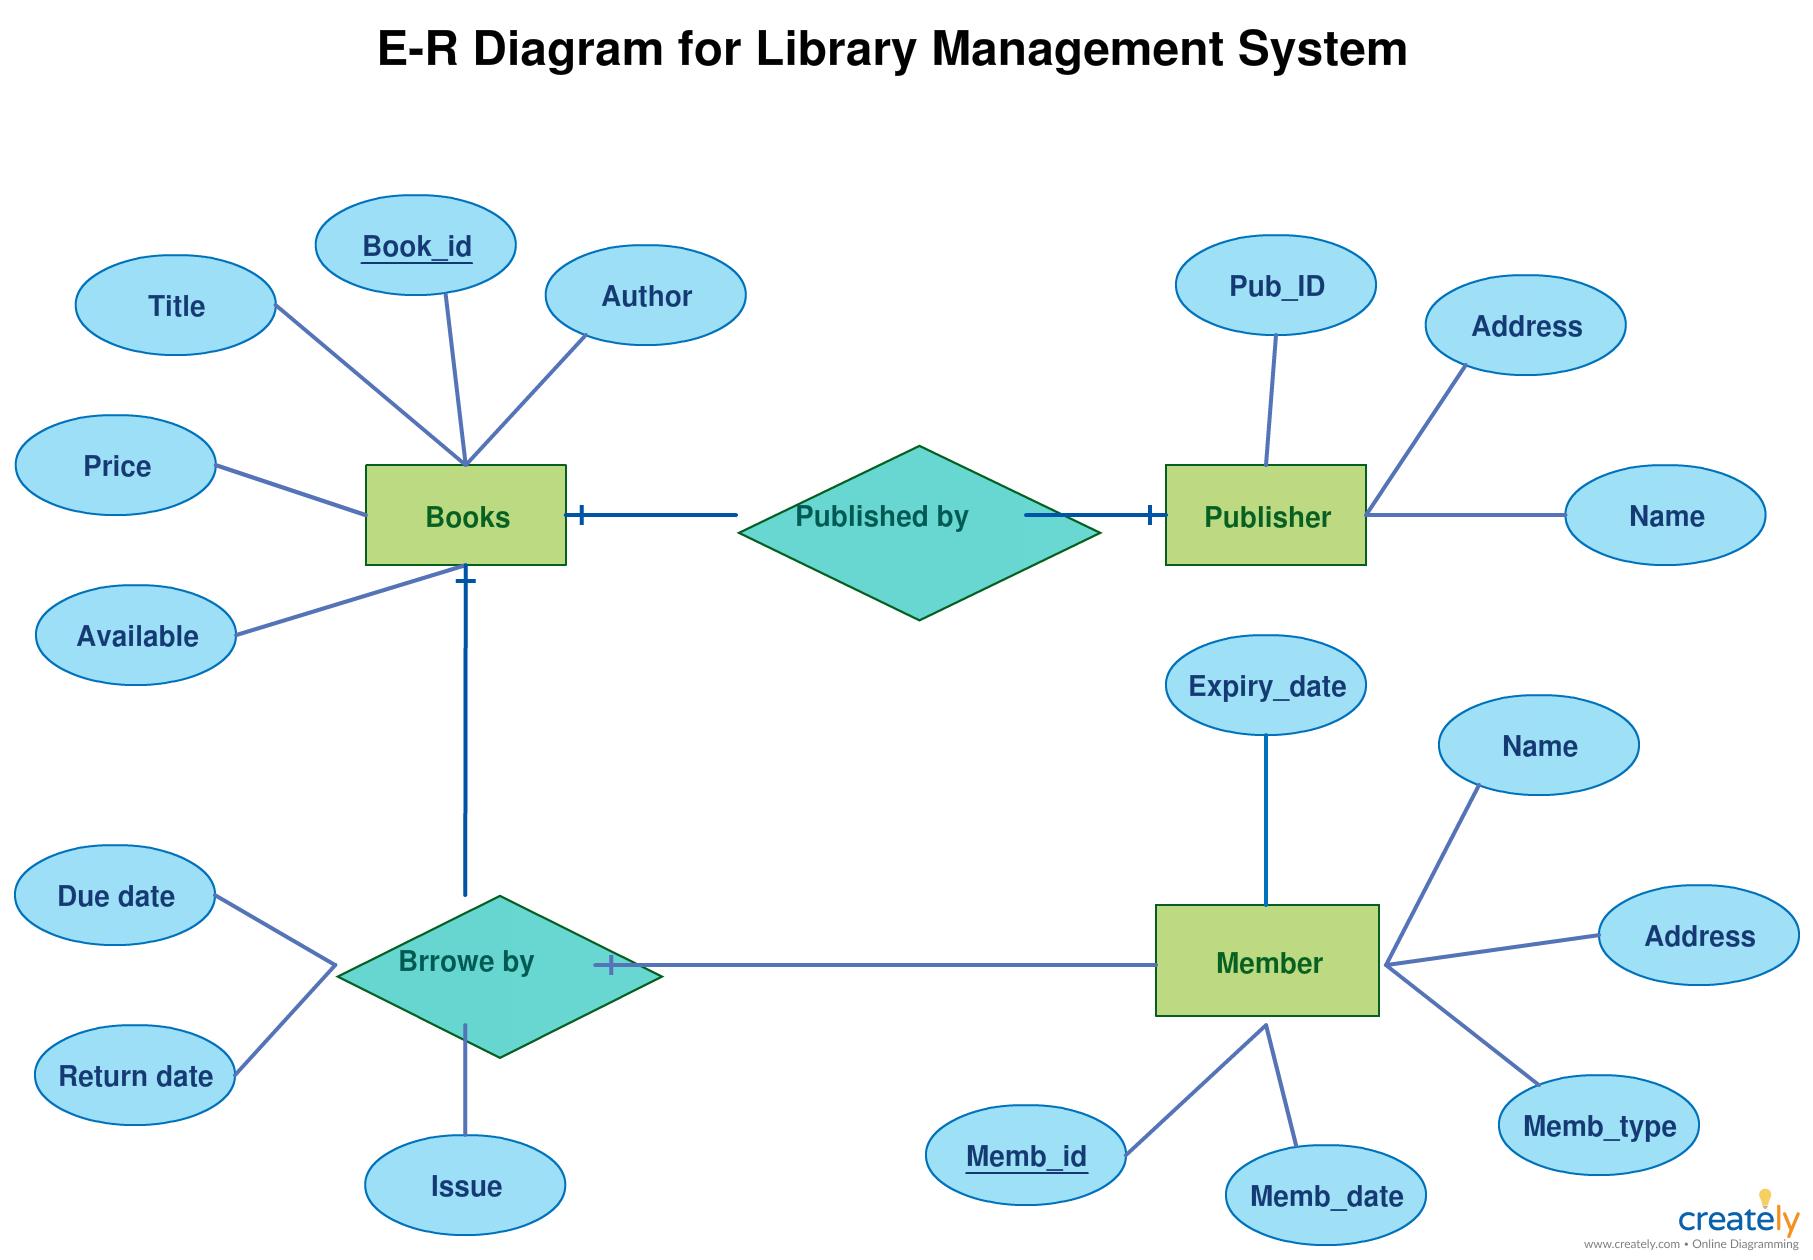 Er Diagram Tutorial | Data Flow Diagram, Diagram, Class Diagram pertaining to How To Draw Er Diagram For Project